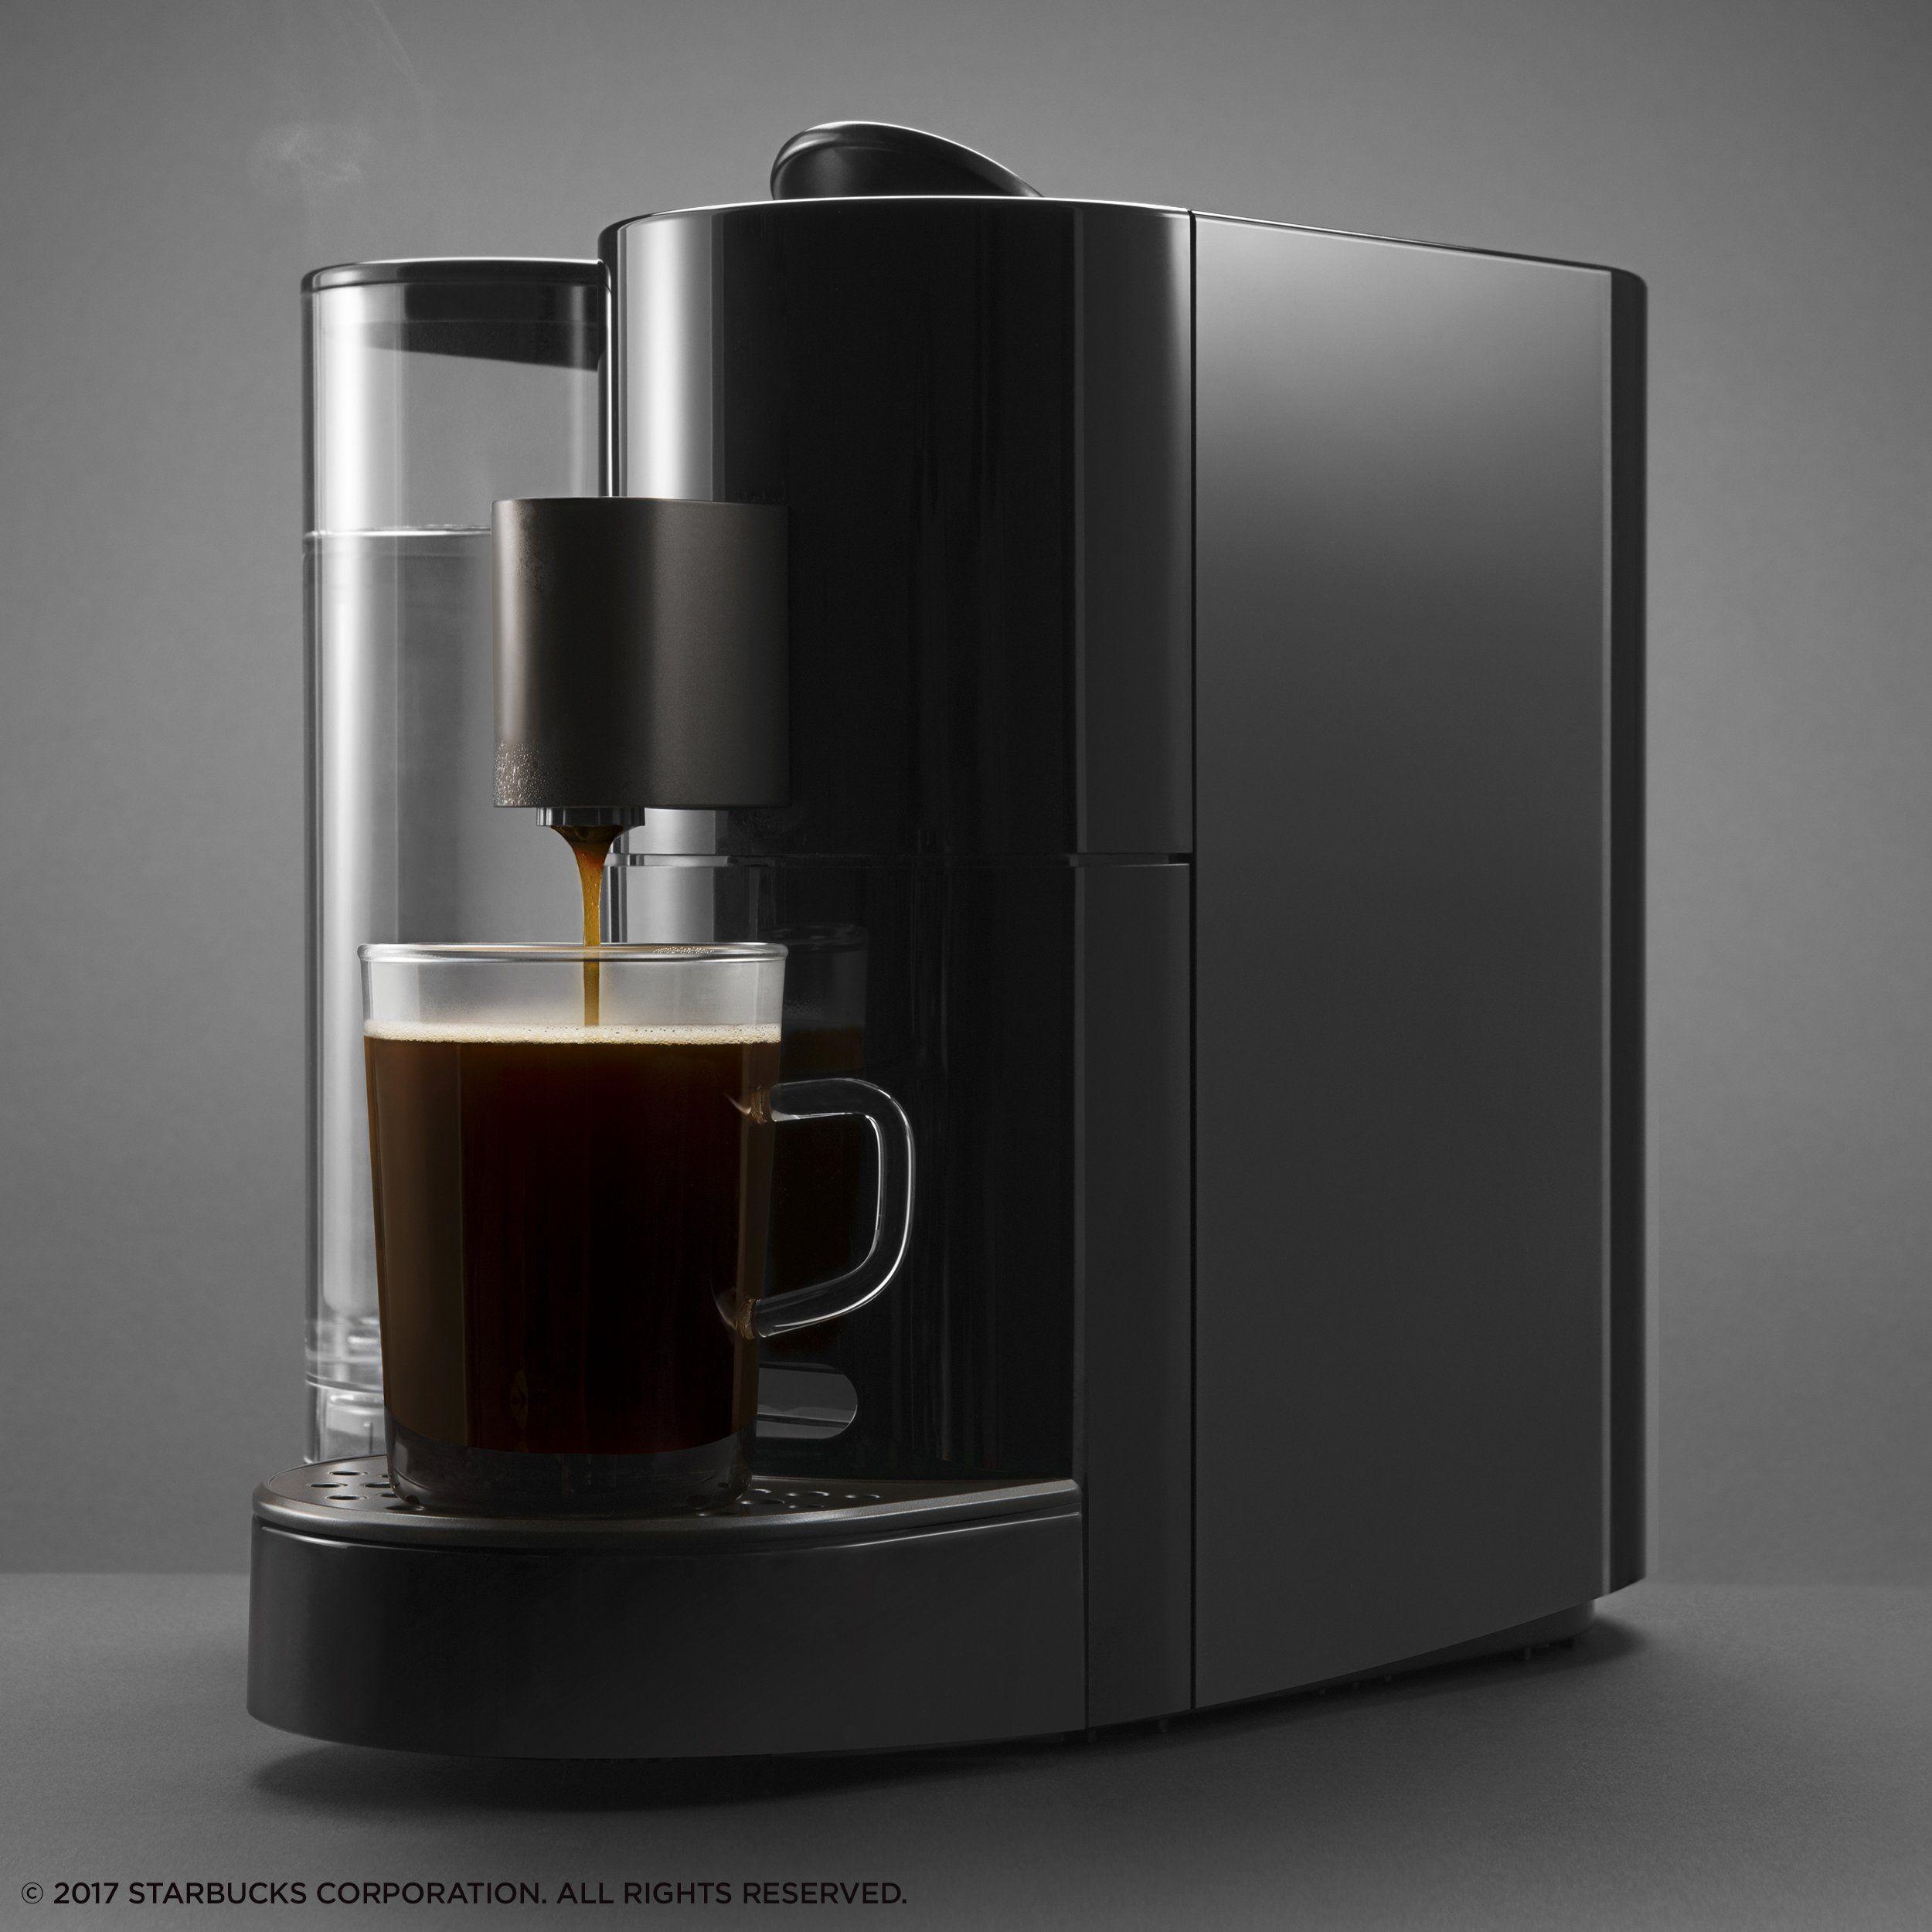 Starbucks Verismo Coffee And Espresso Single Serve Brewer